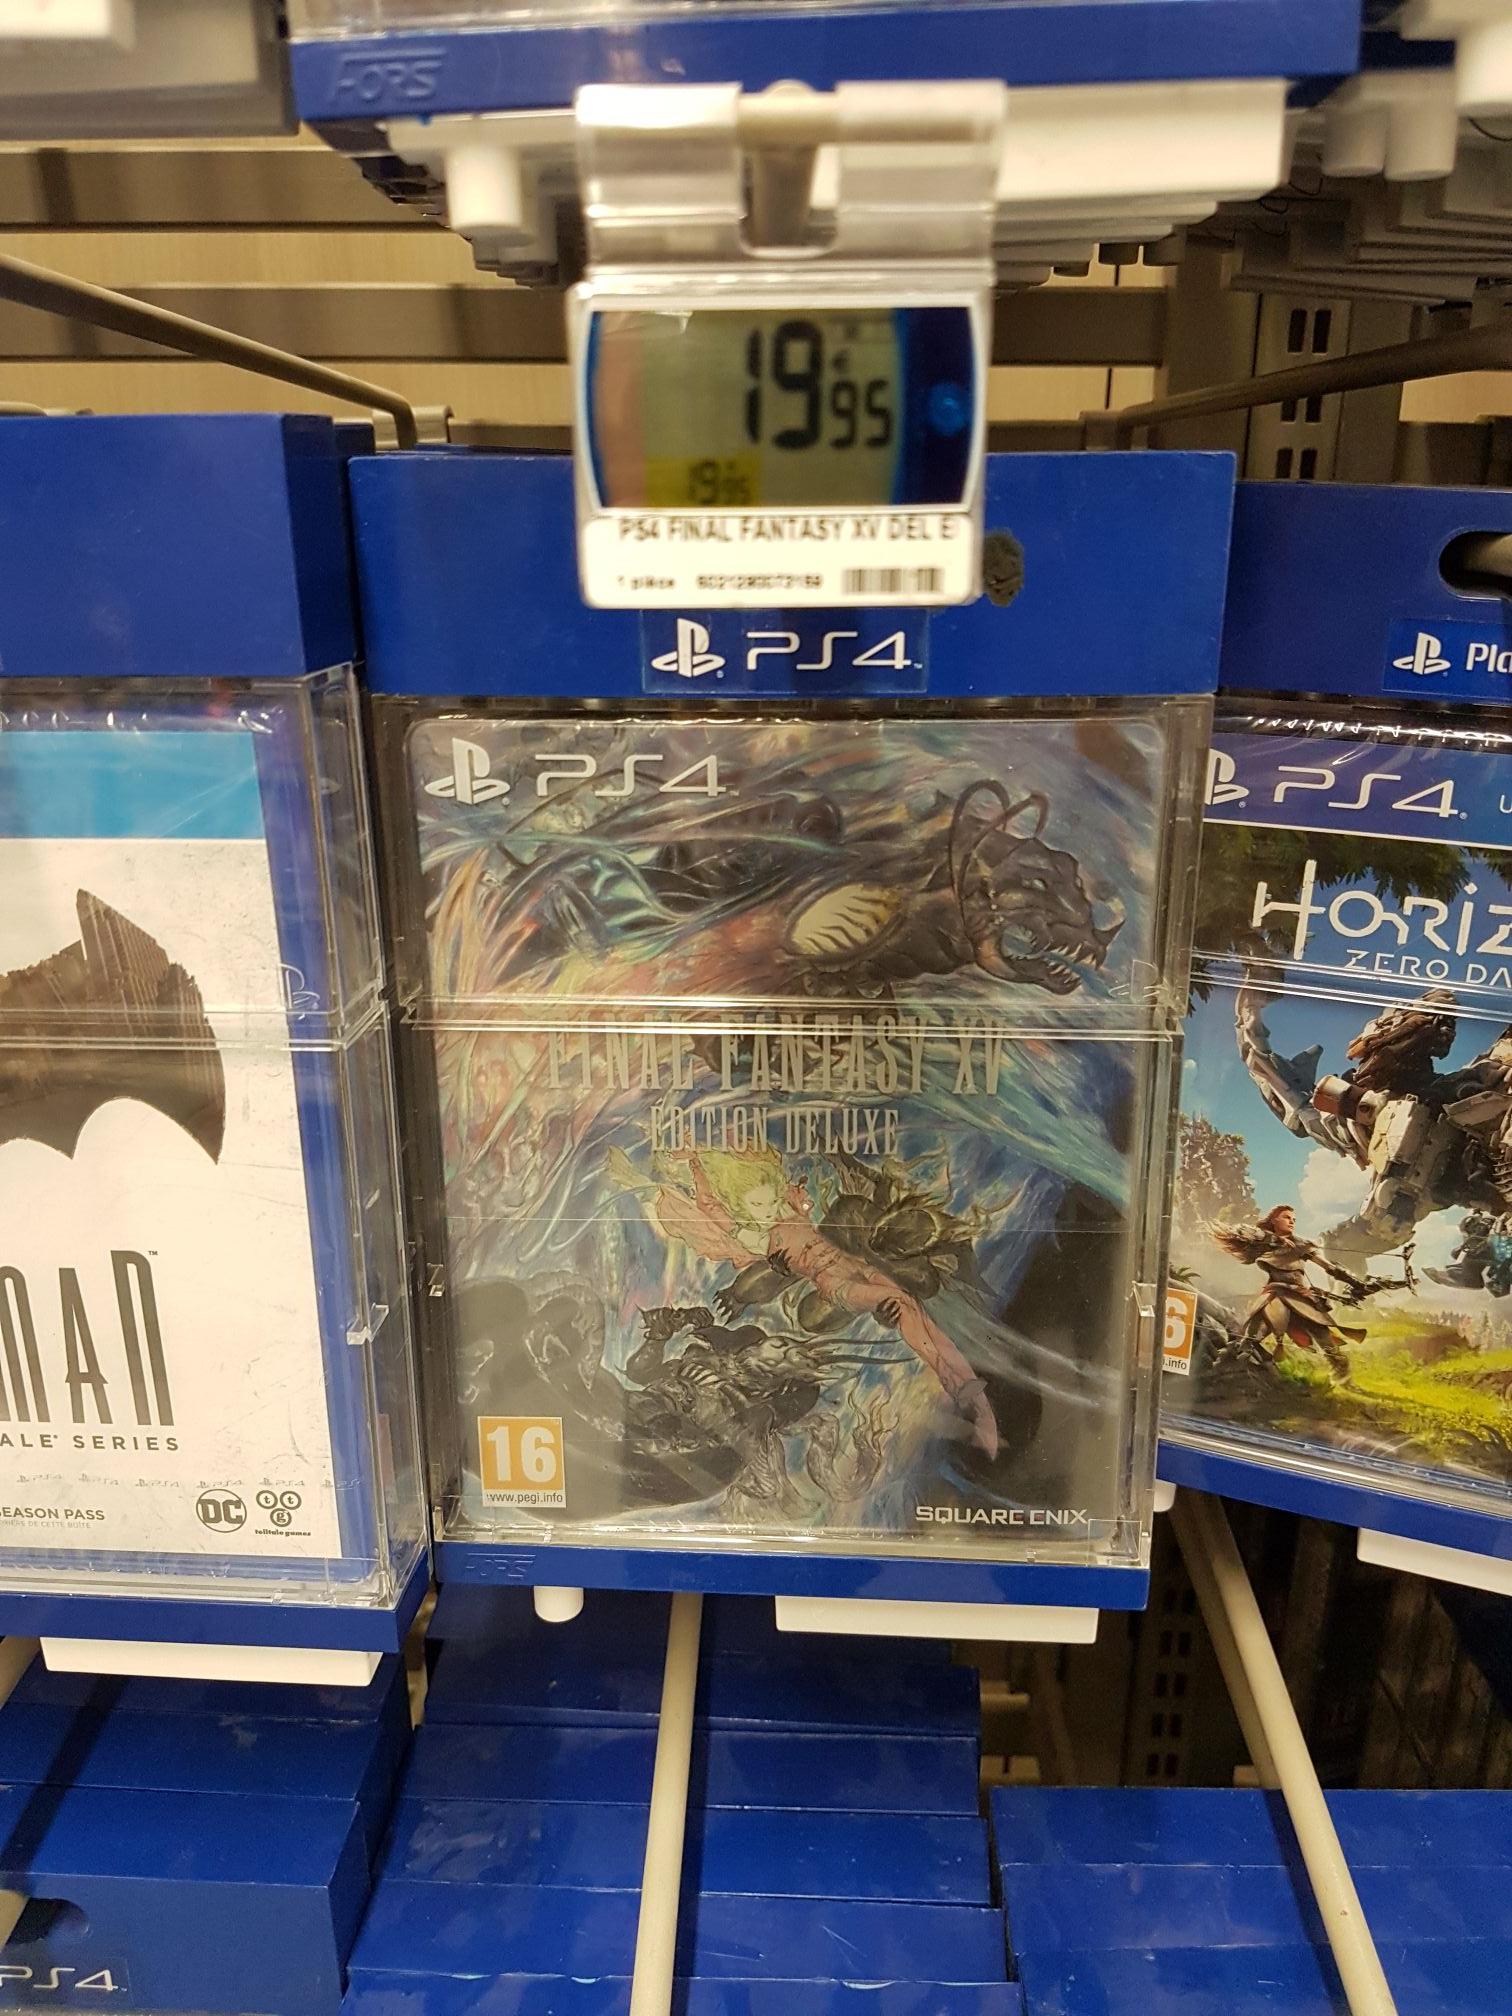 Final fantasy XV édition deluxe sur PS4 - Noisy Le Grand (93)